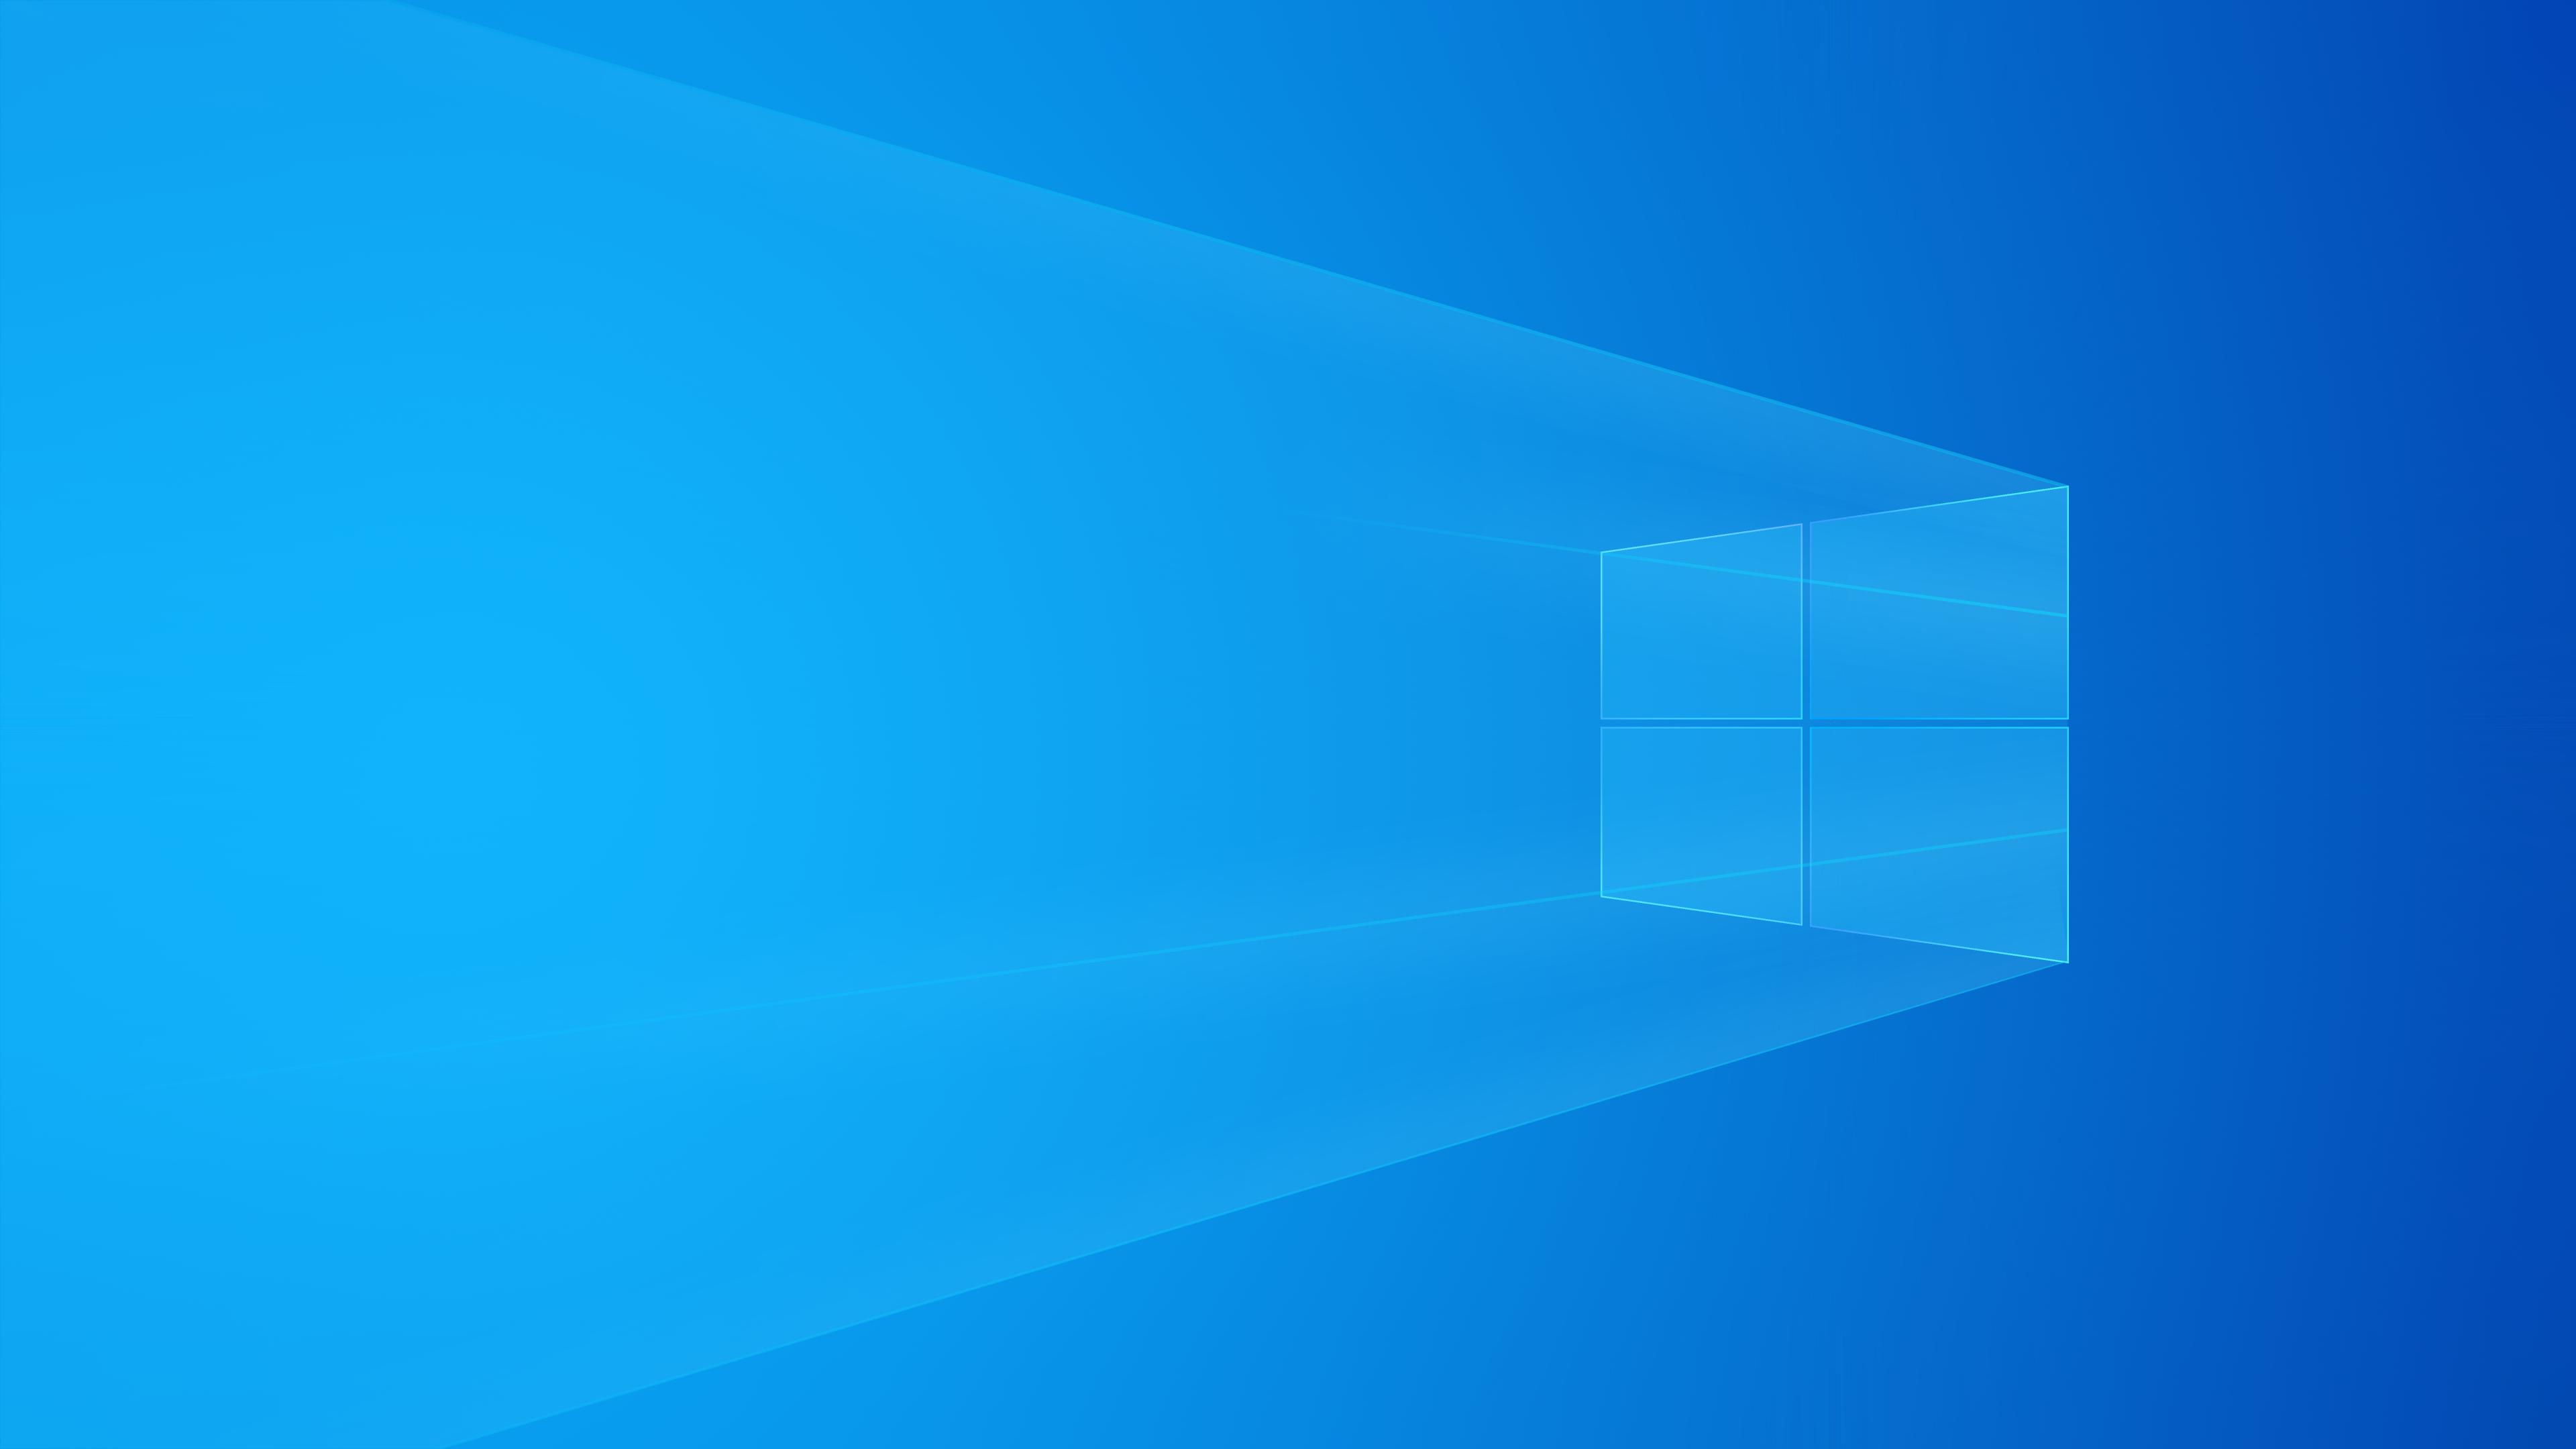 Fond D Ecran Windows 10 4k 3840x2160 Trufo 1910547 Fond D Ecran Wallhere